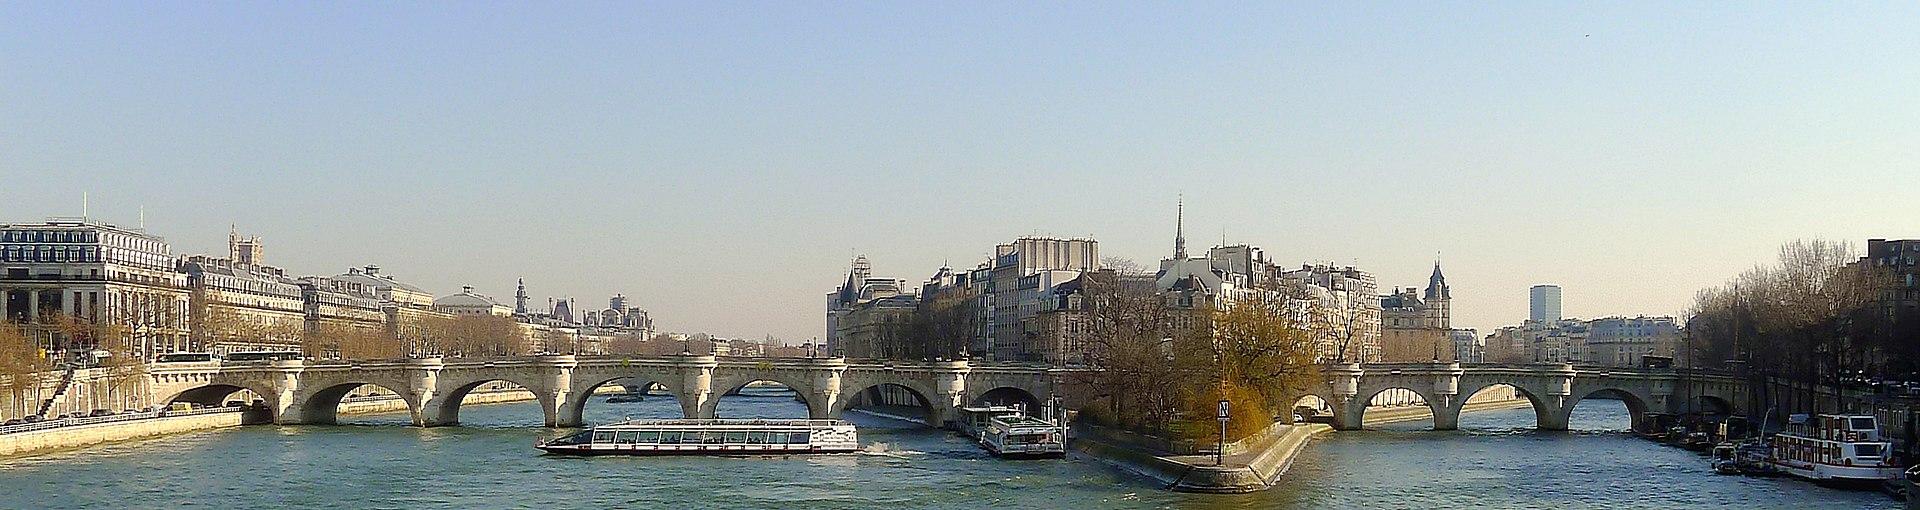 P1080150 Paris Ier et VI pont Neuf rwk.JPG